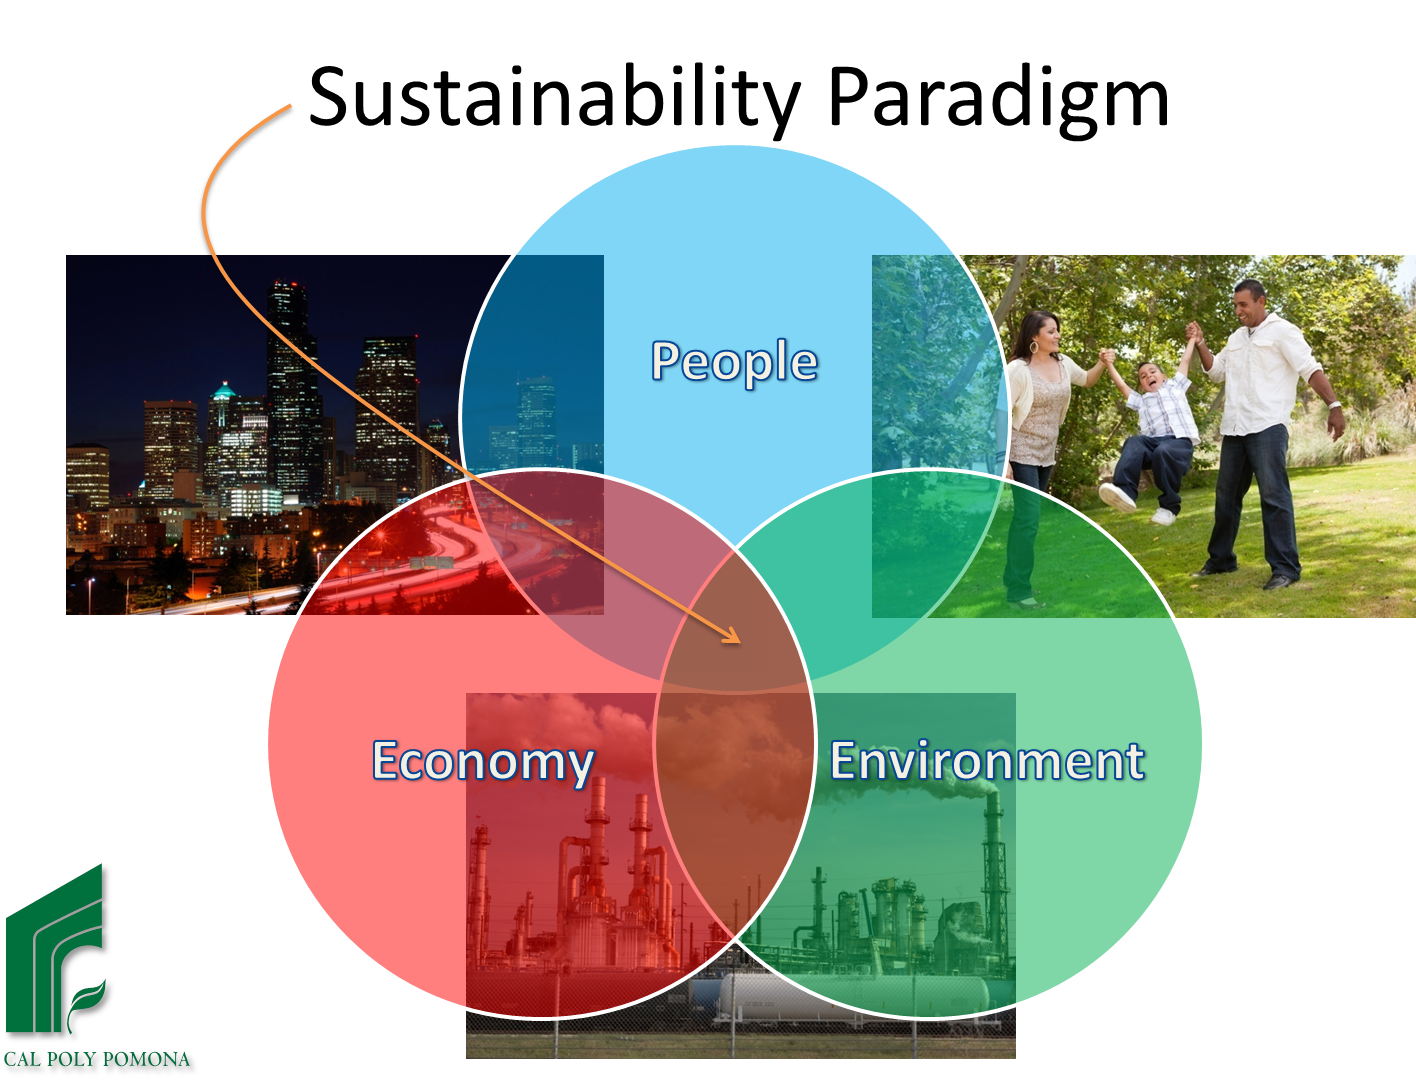 Sustainability paradigm